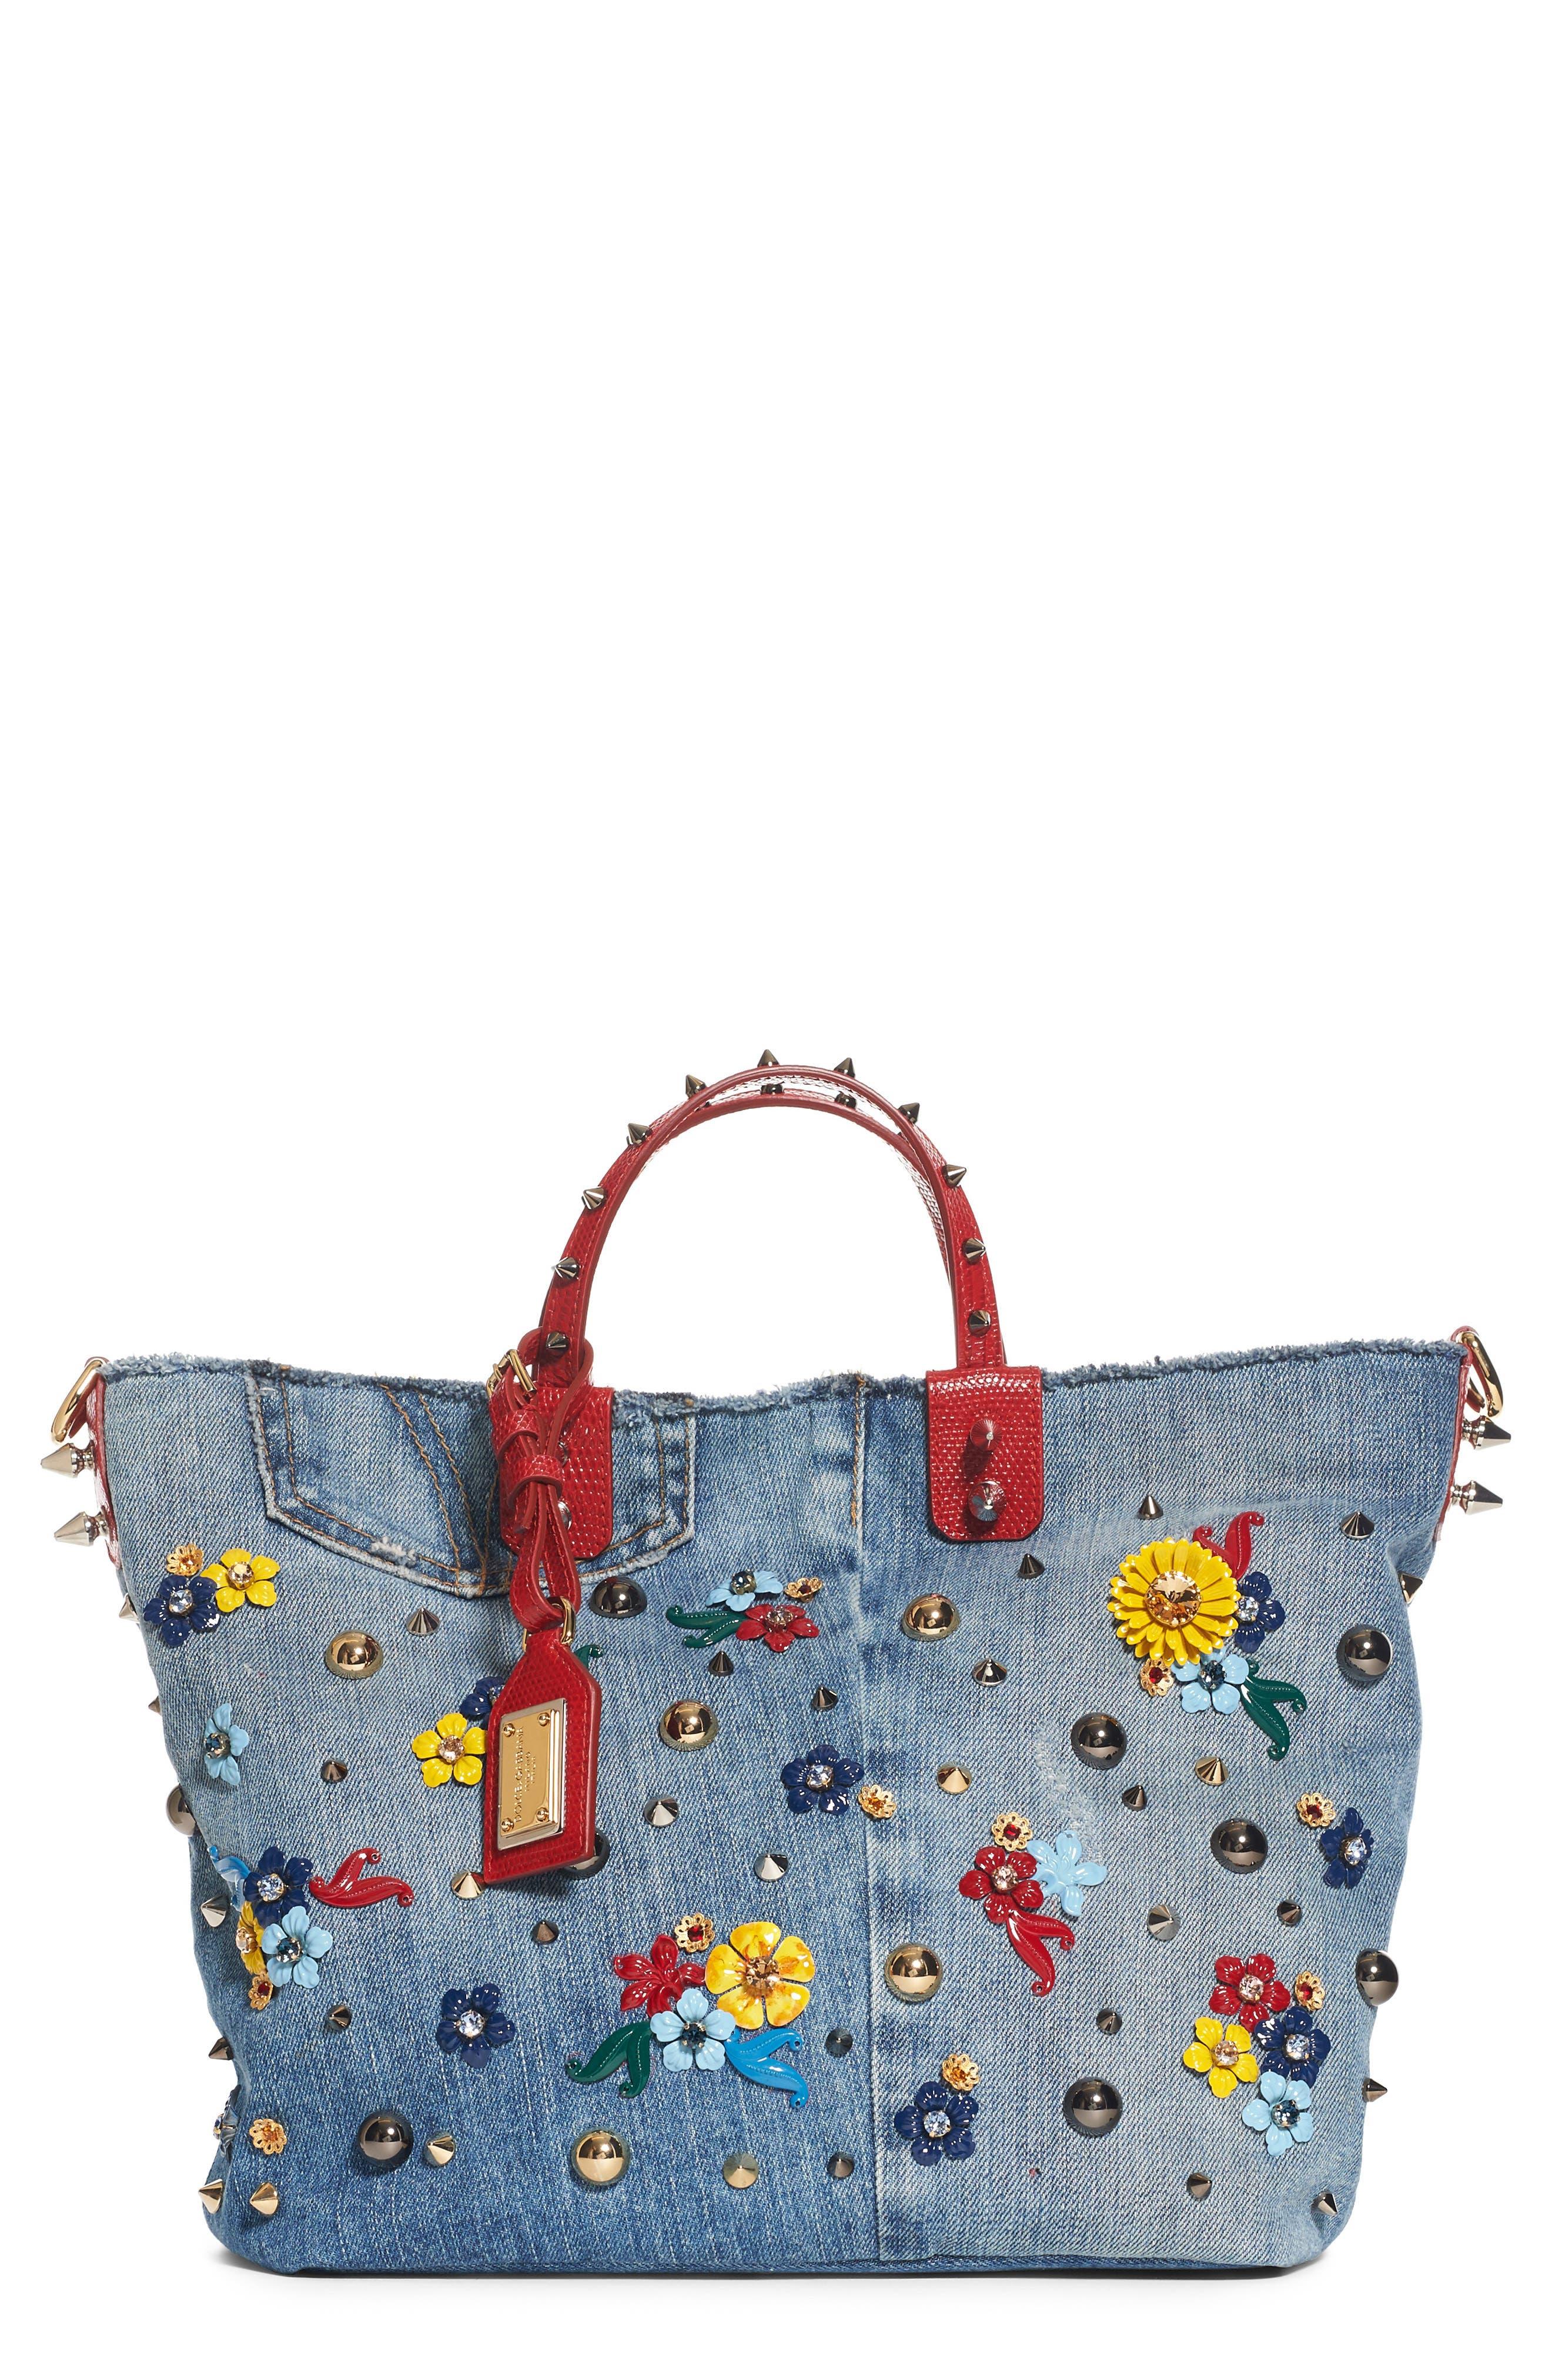 Alternate Image 1 Selected - Dolce&Gabbana Small Embellished Denim Tote